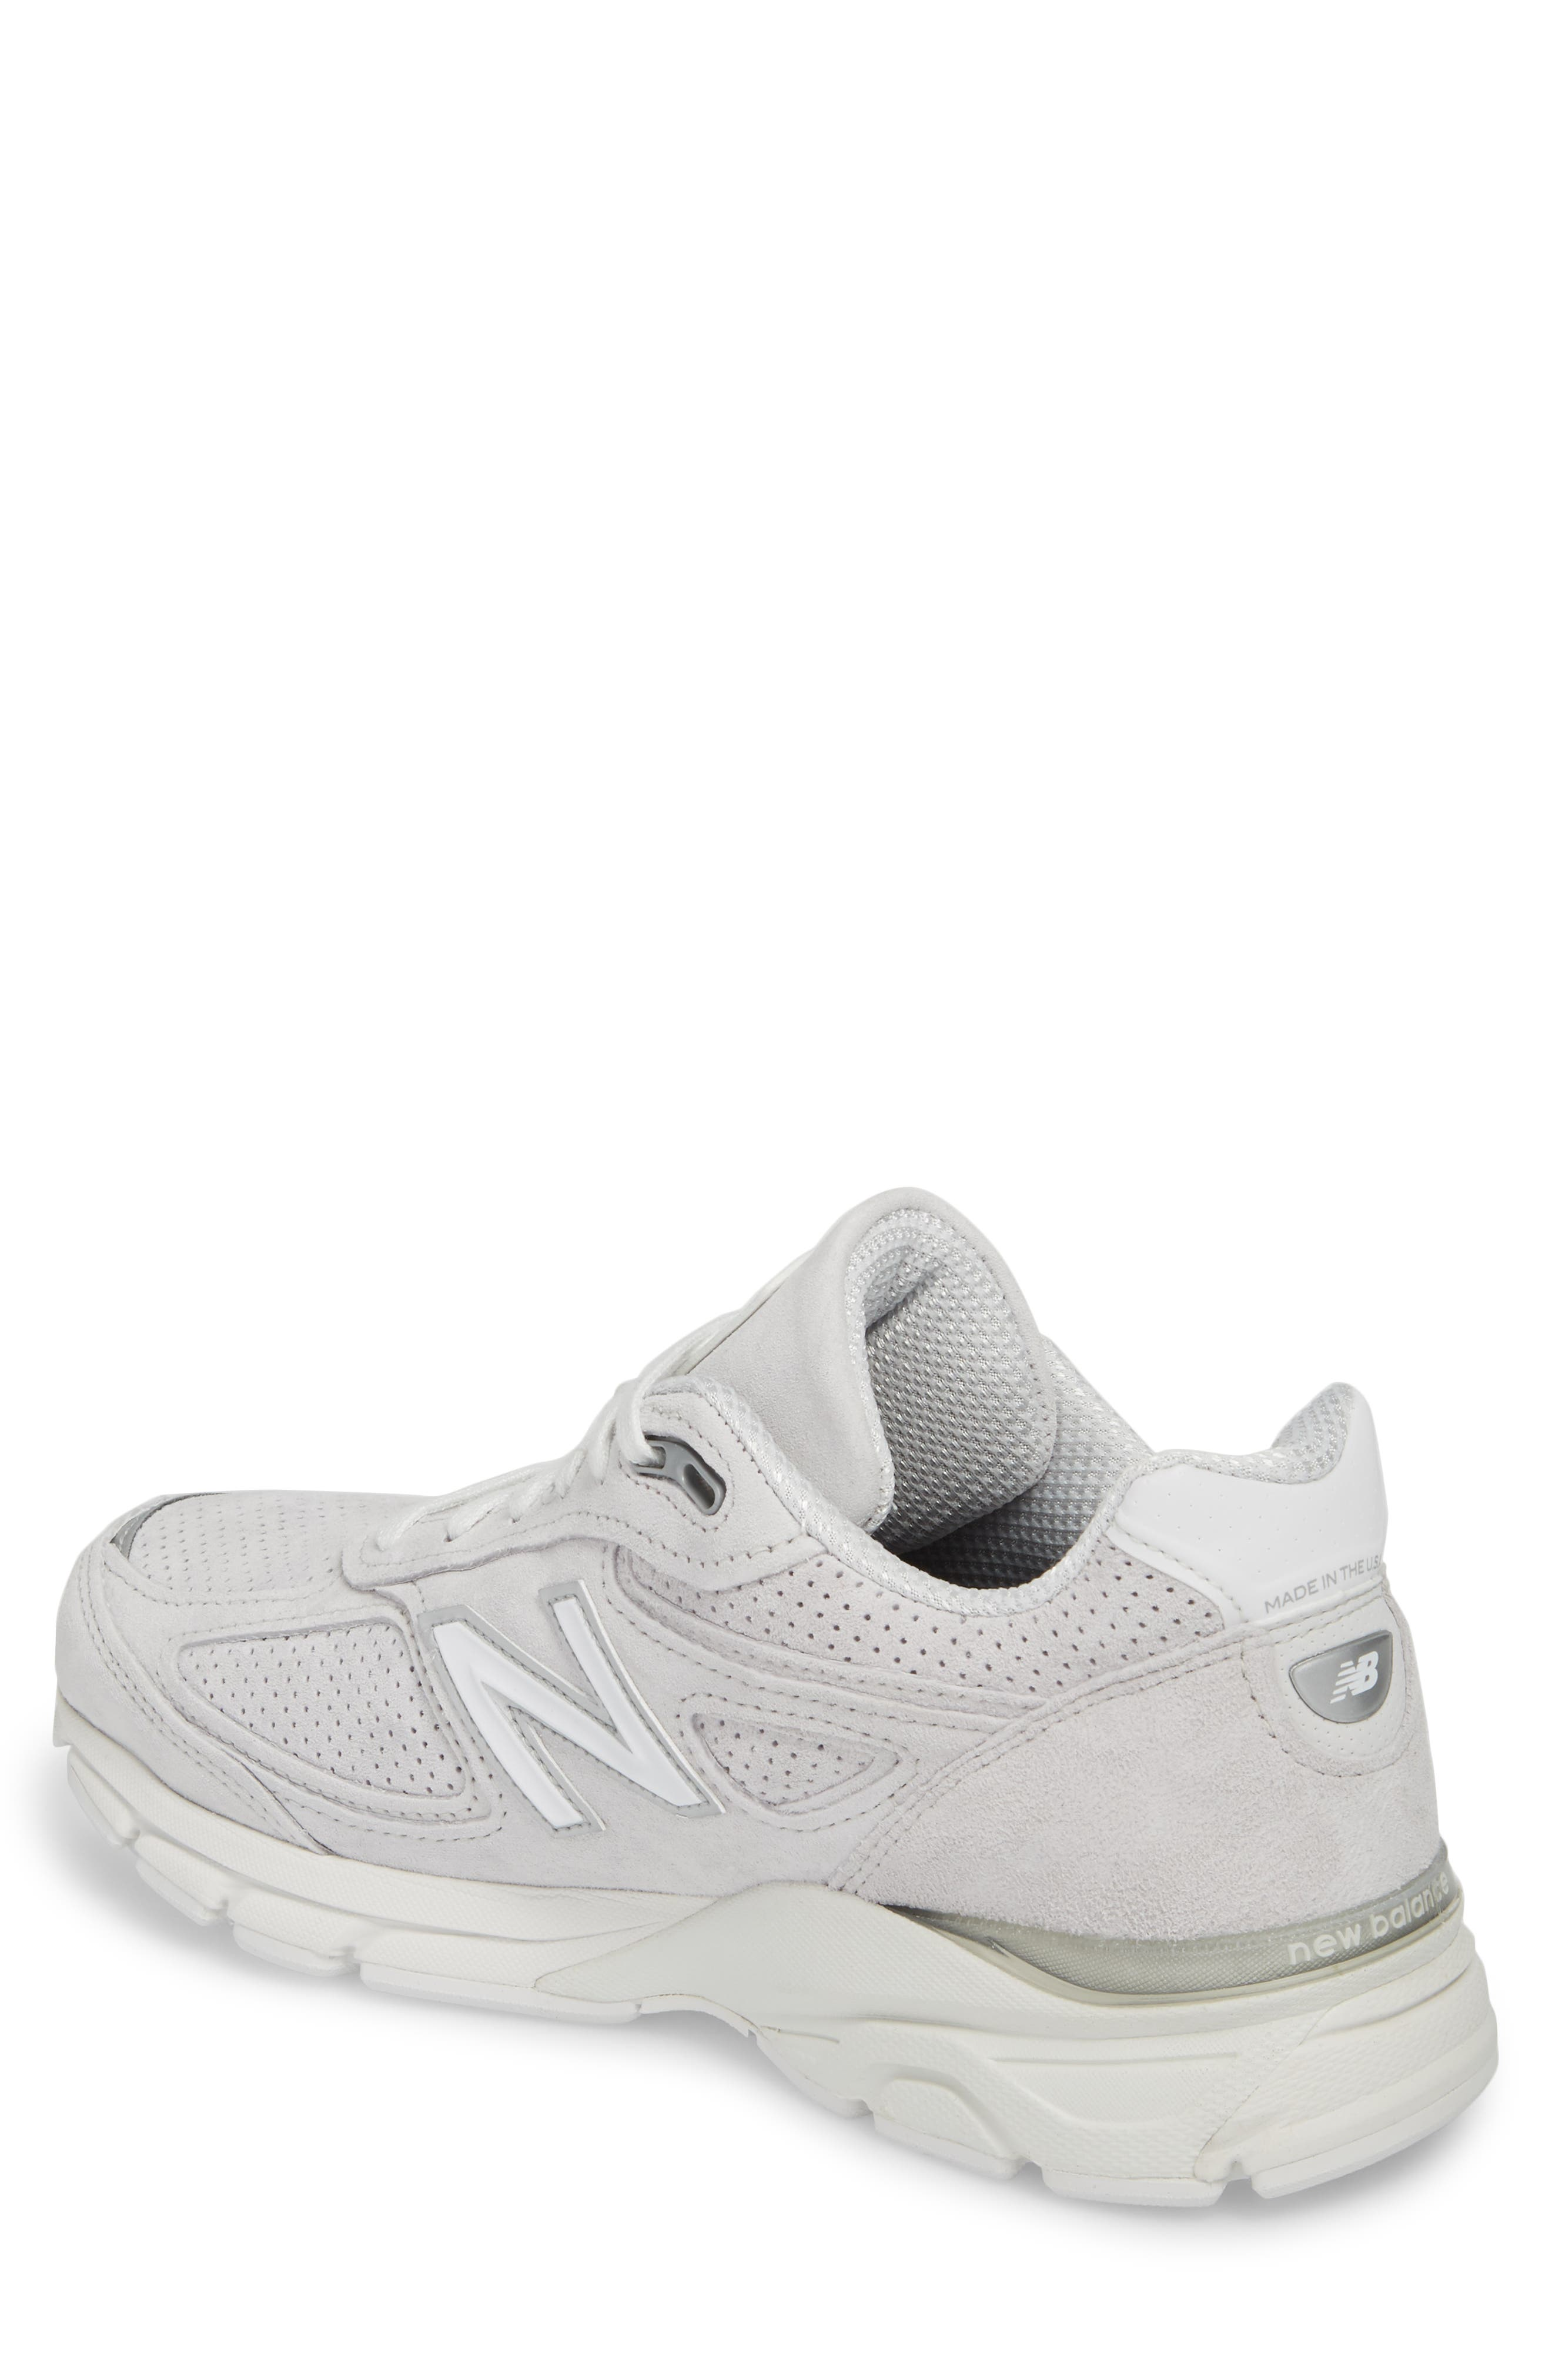 990v4 Perforated Sneaker,                             Alternate thumbnail 2, color,                             Arctic Fox